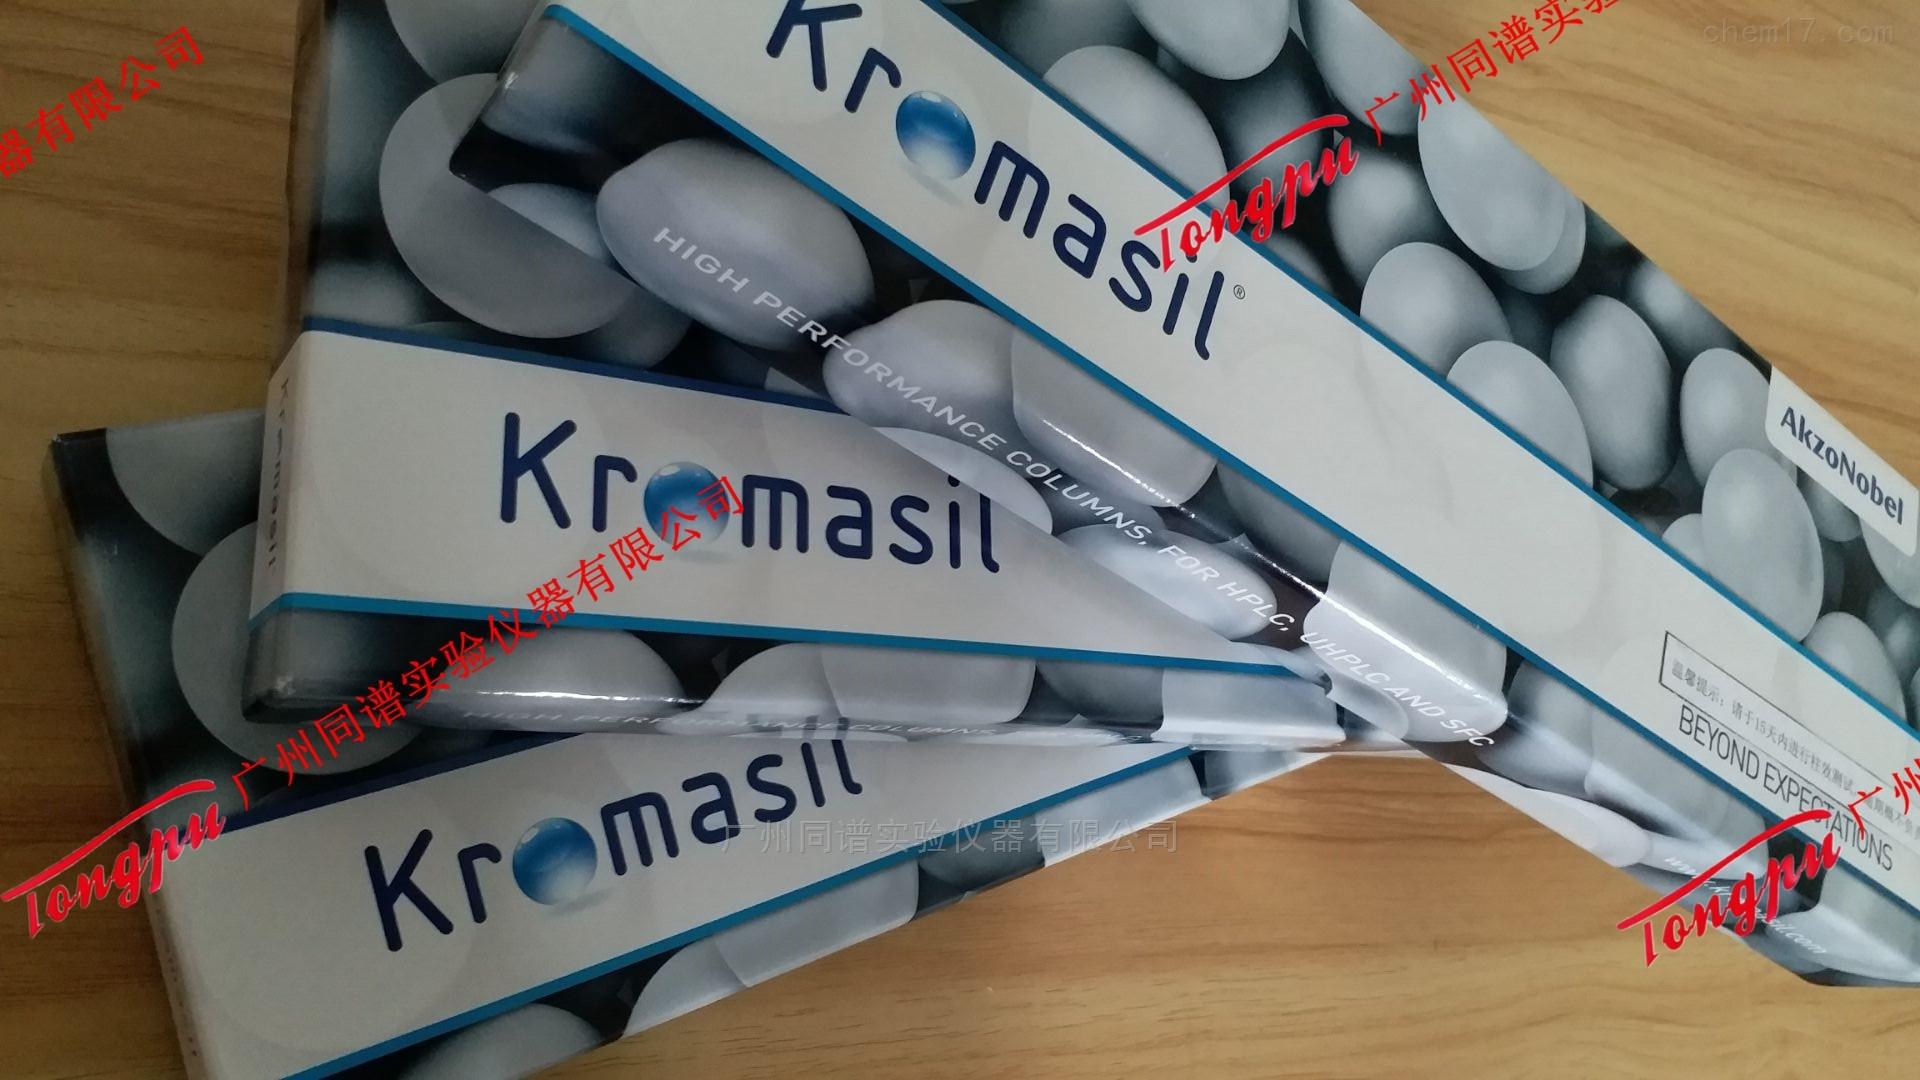 Kromasil 300-10-NH2 氨基色谱柱(L10NHA25)